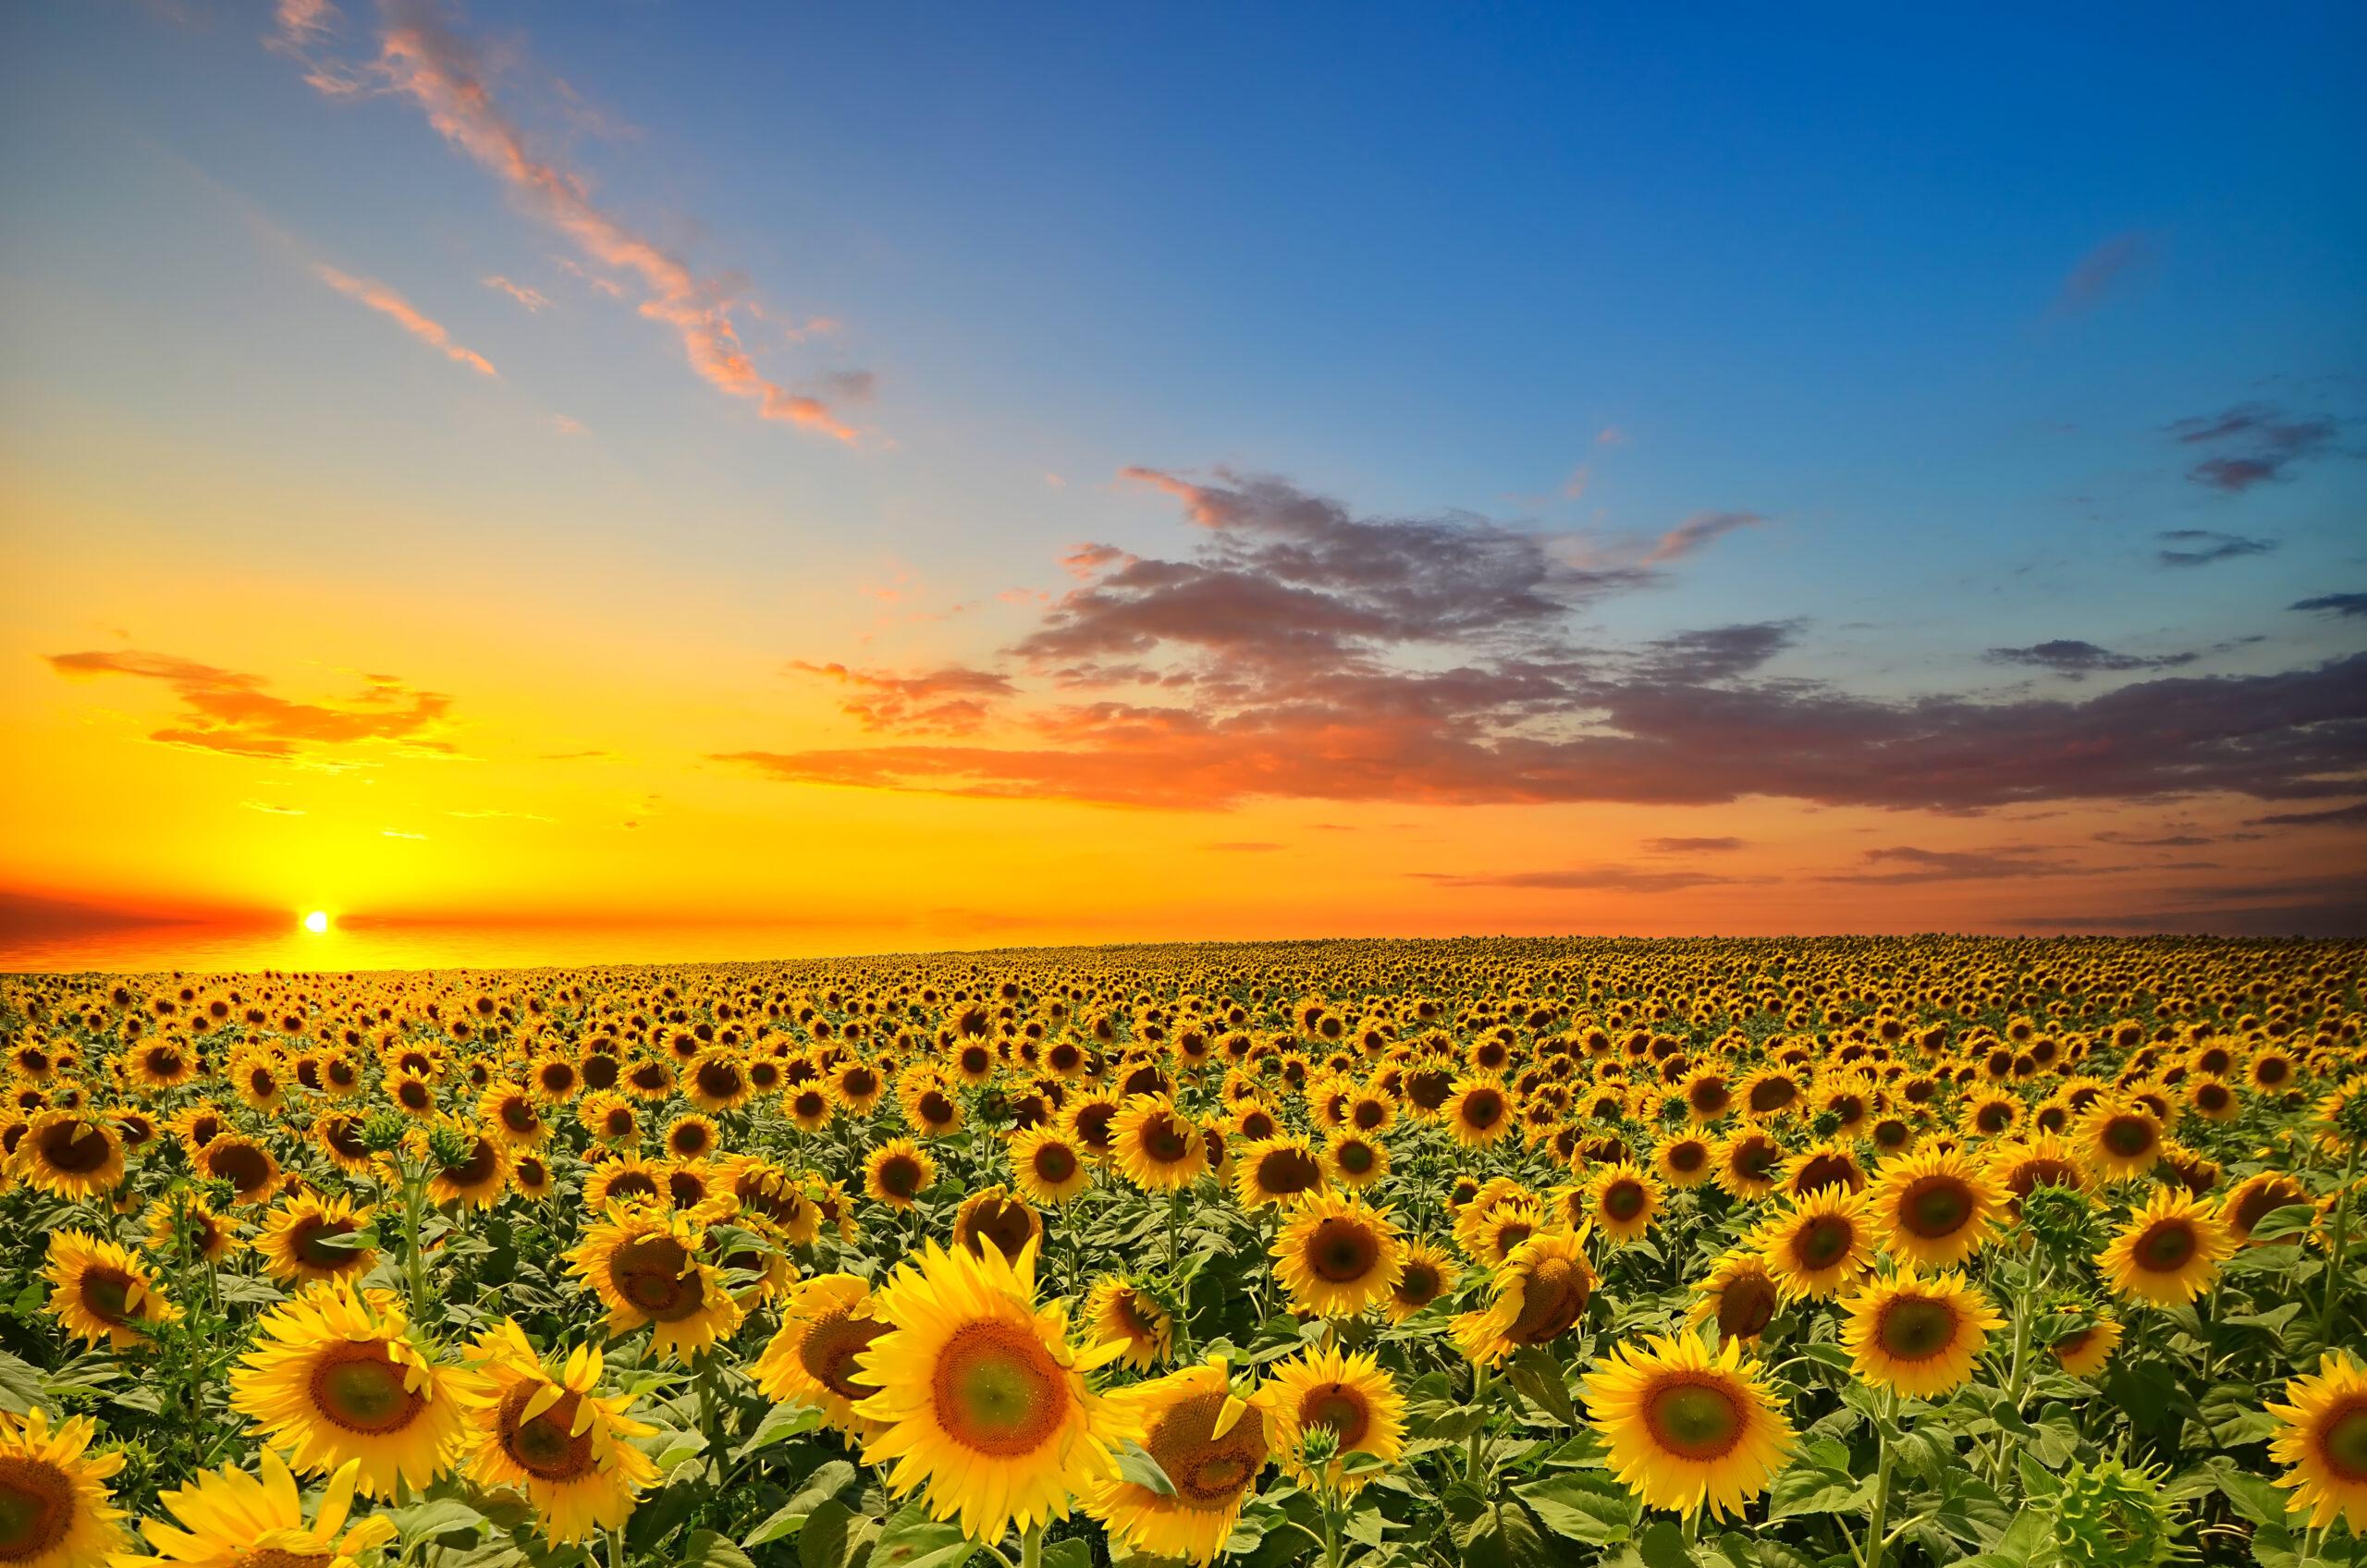 The Sunflower Effect